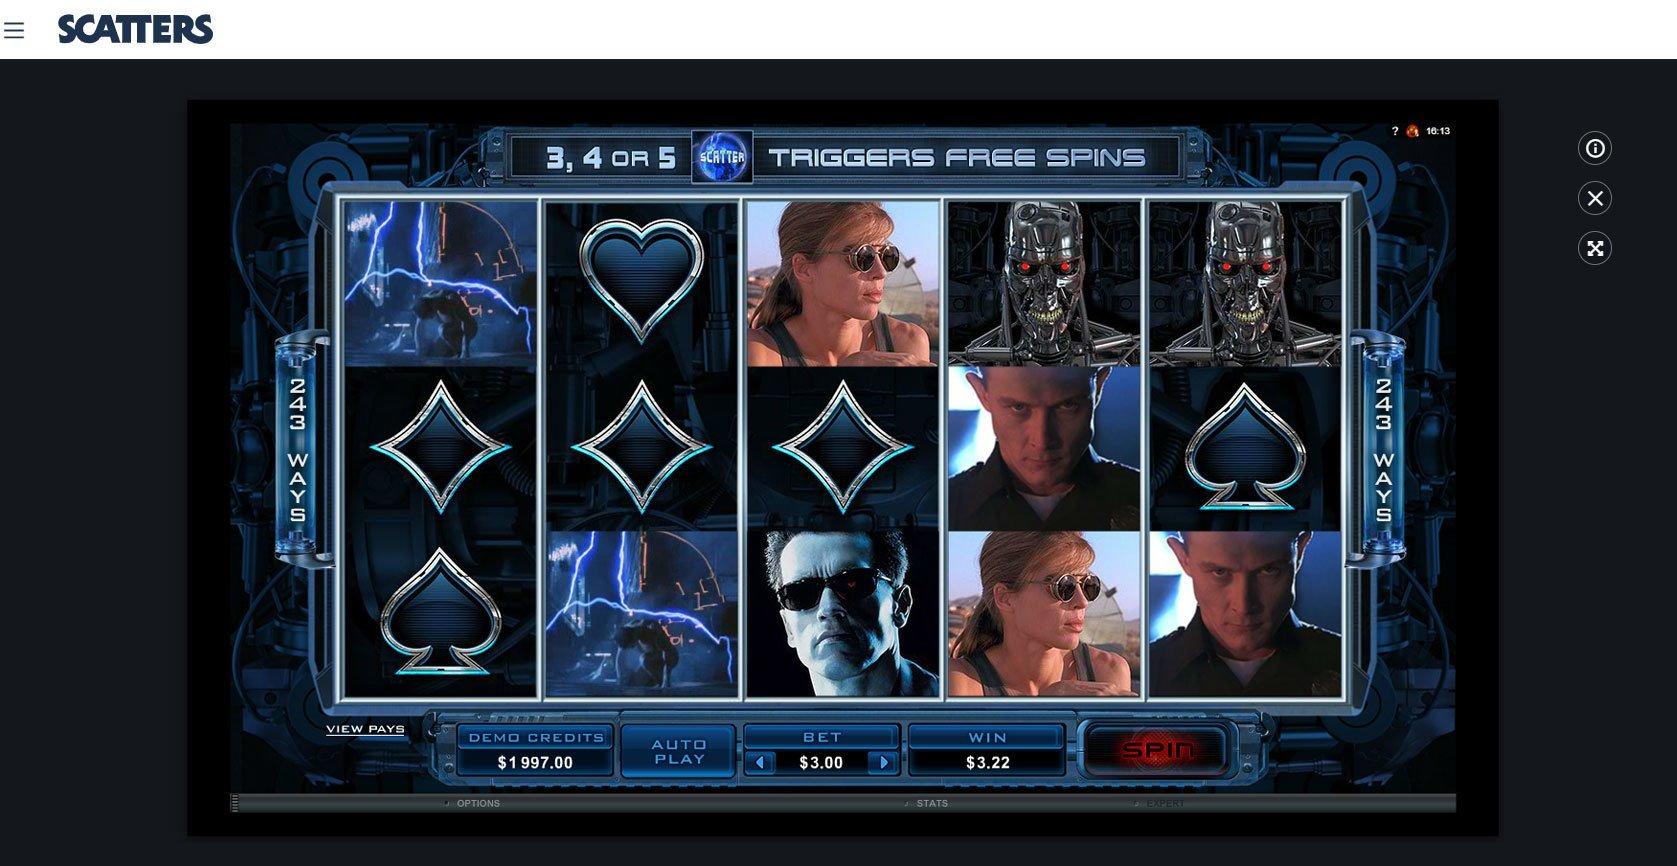 Terminator 2 Online Slot - Scatters Slots Casino